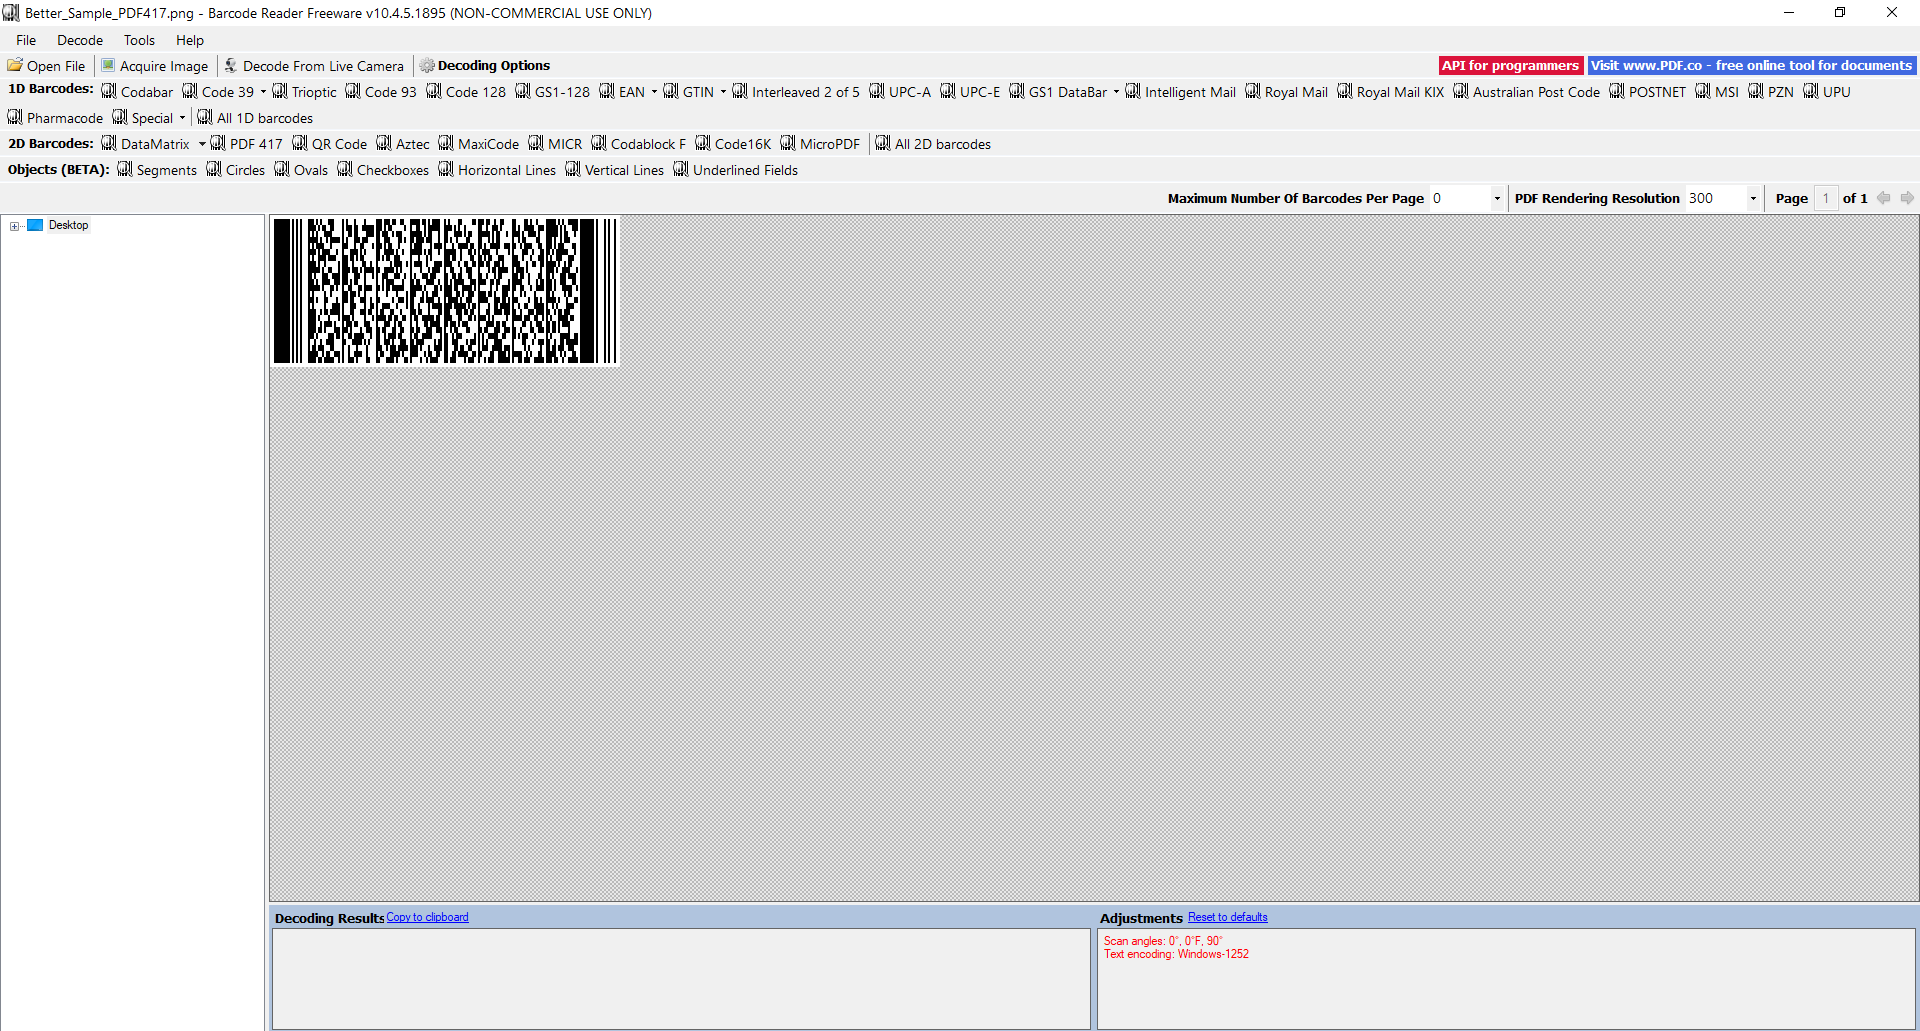 PDF417 Barcodes